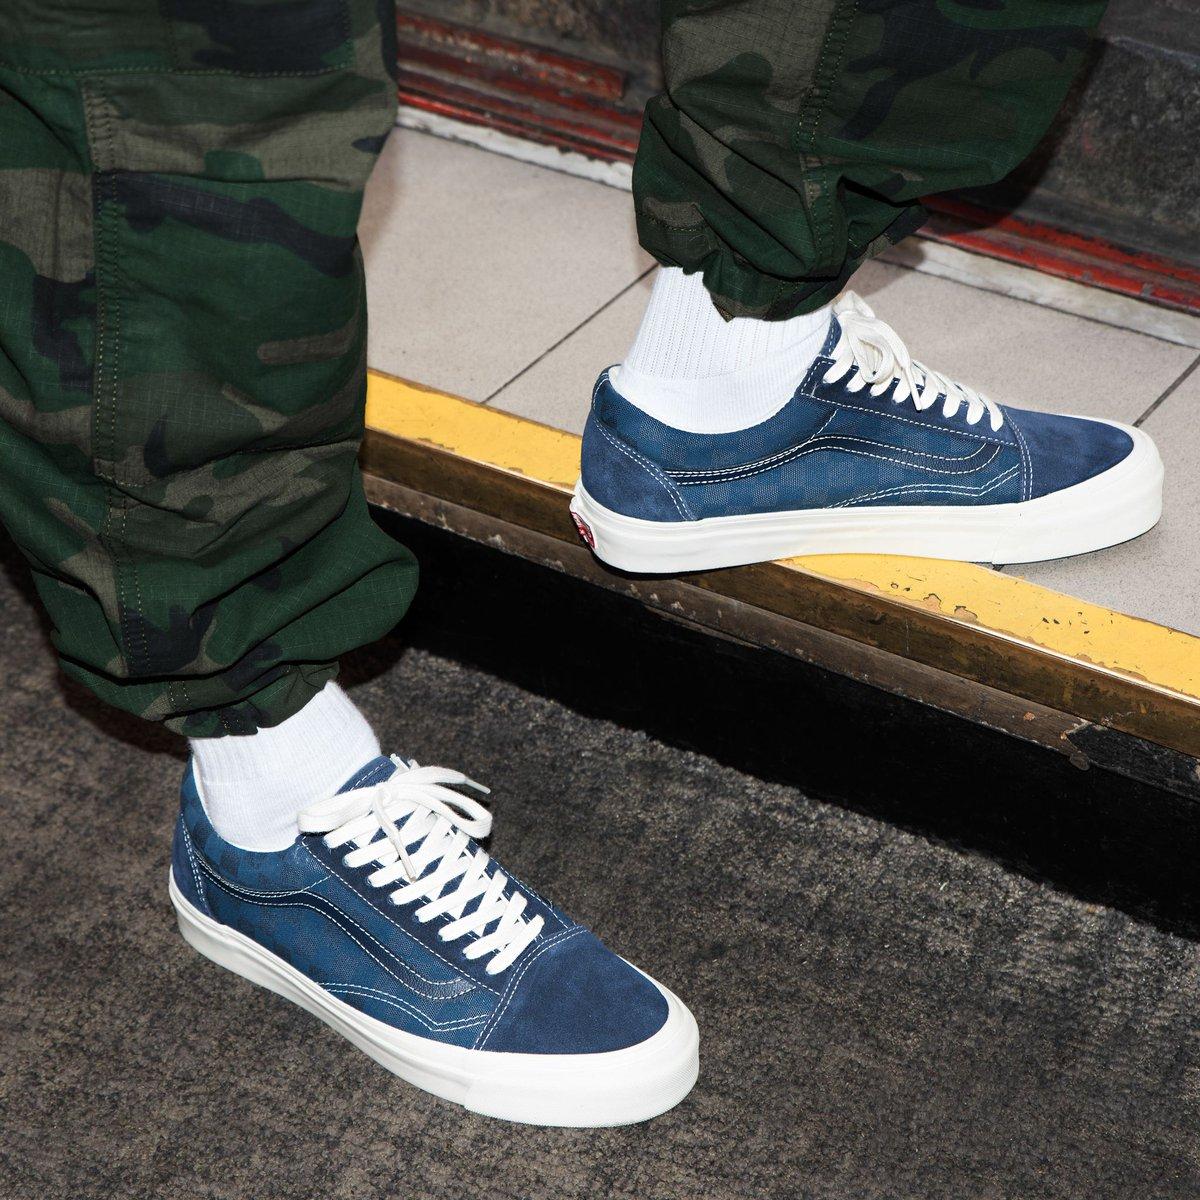 30ff08a91c Vans Vault OG Old Skool LX Checkerboard Majolica Blue Wear Vietnam